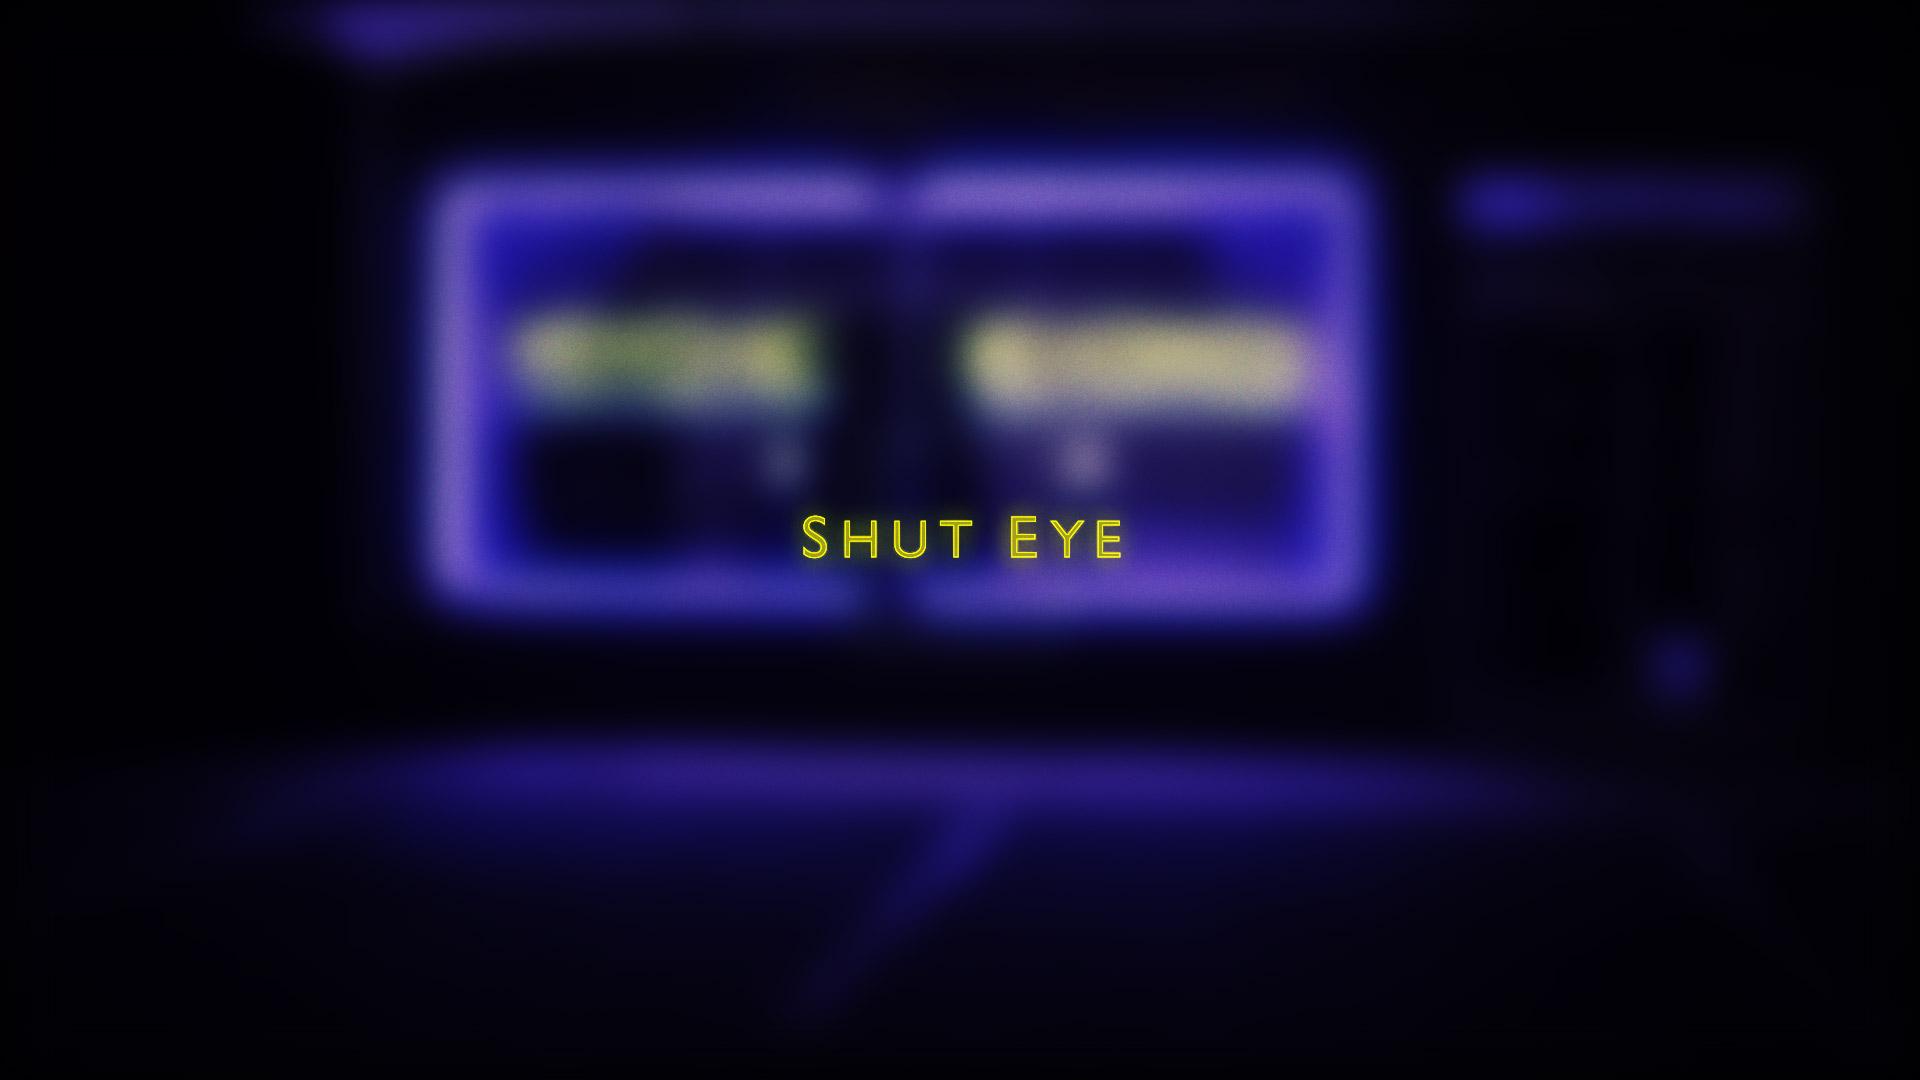 tcgstudio-shut-eye-main-title-v3_00001.jpg